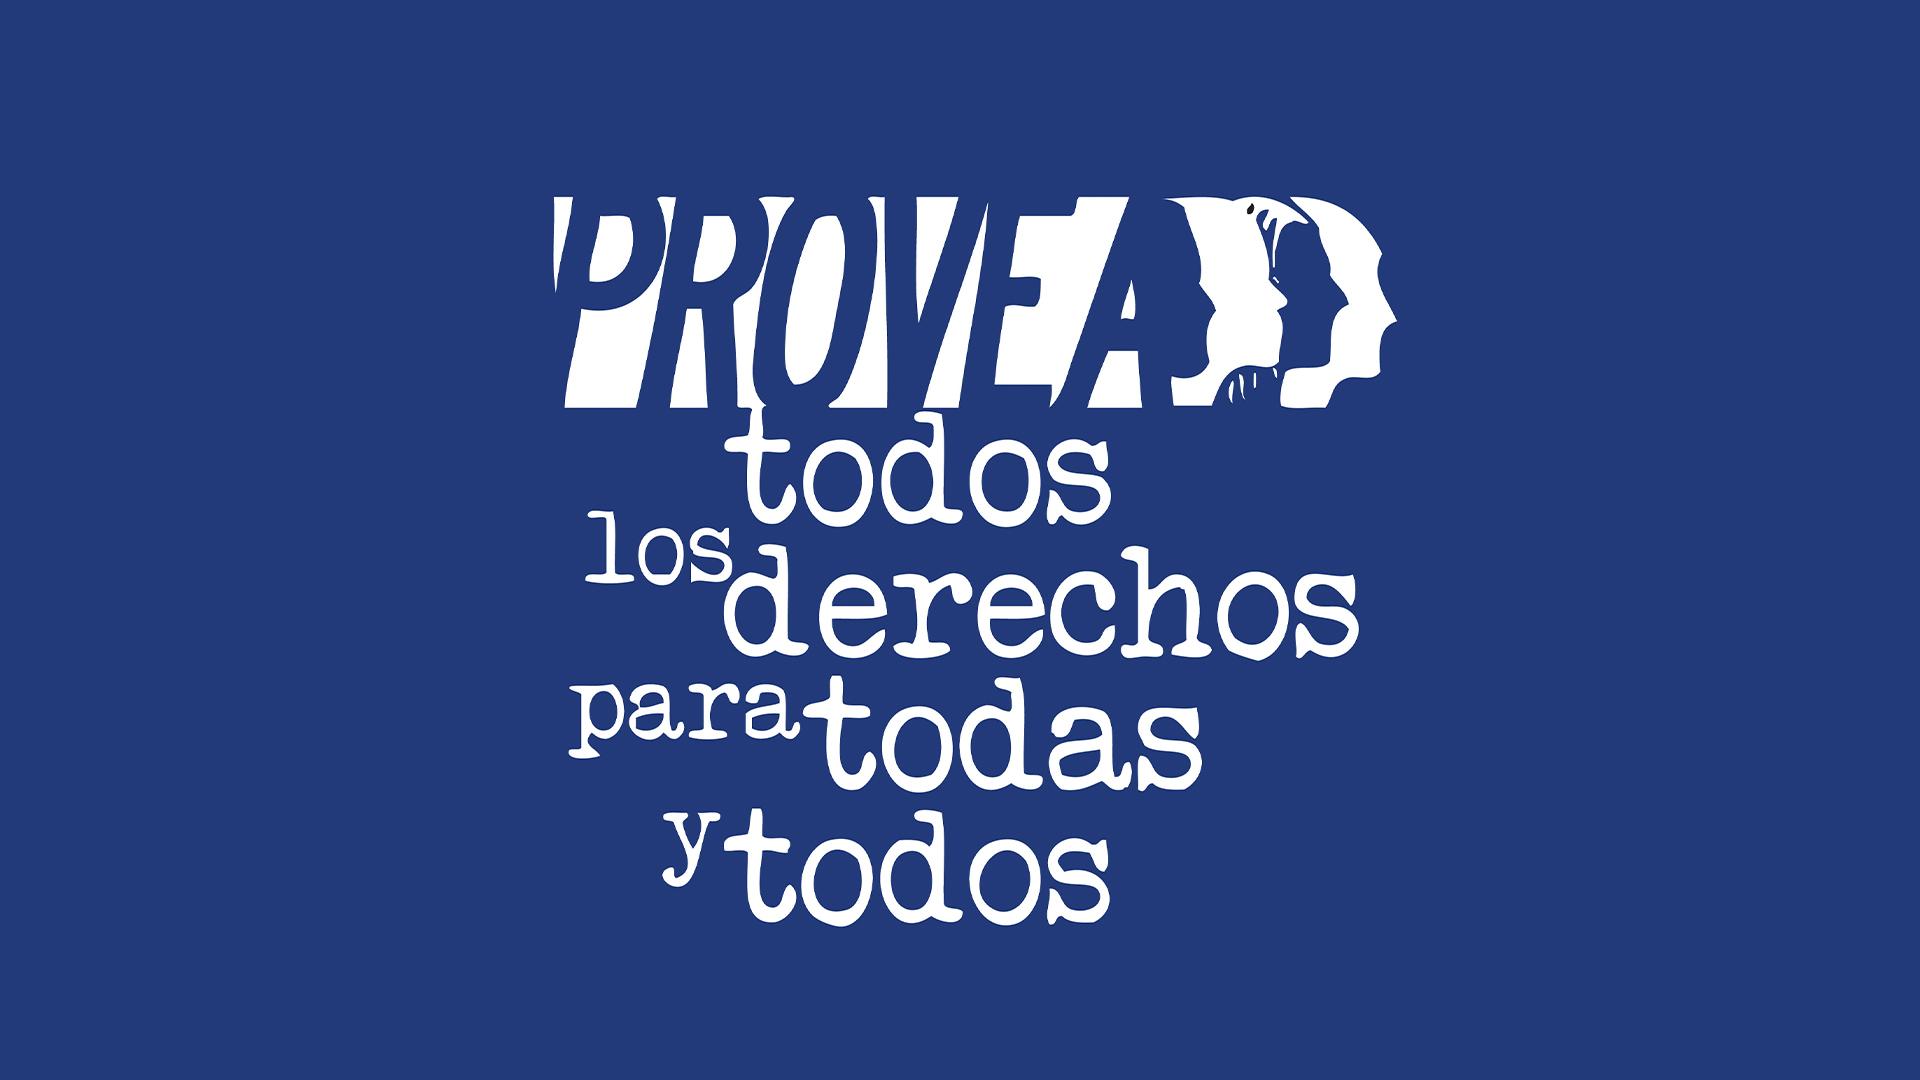 Provea: Estado venezolano incumple recomendaciones de la OMS sobre el COVID-19